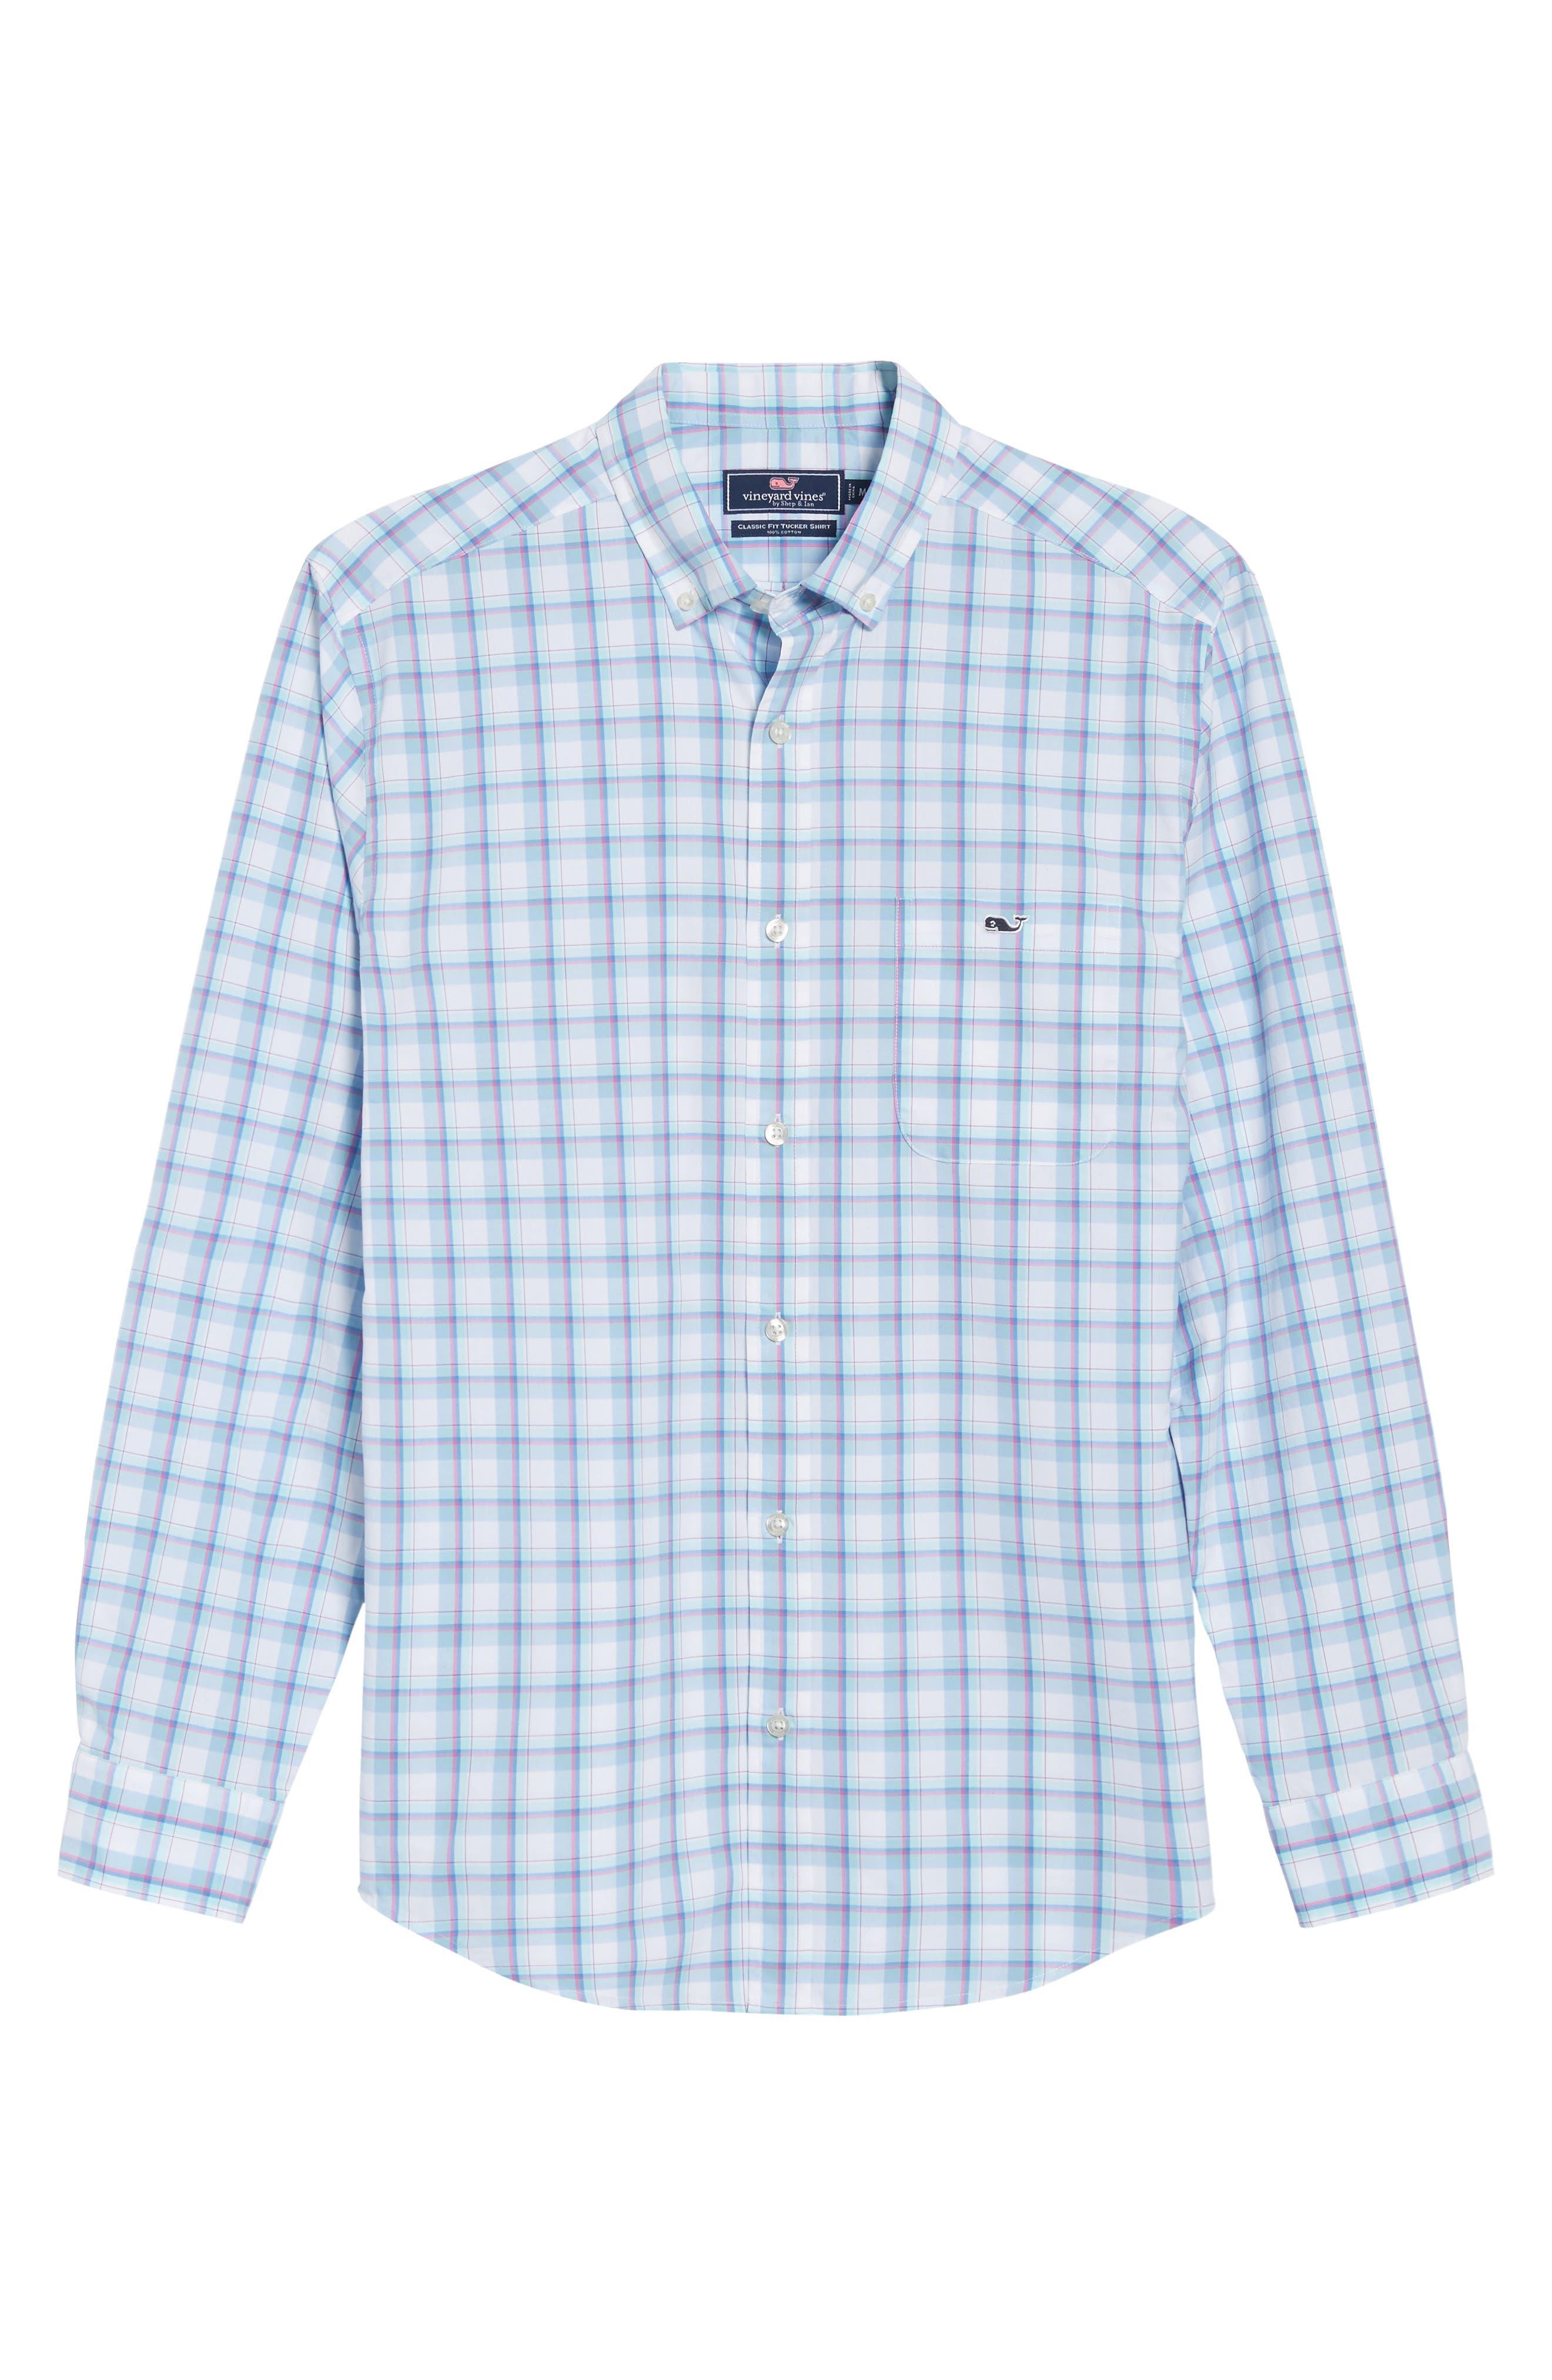 Plaid Classic Fit Sport Shirt,                             Alternate thumbnail 6, color,                             Jake Blue